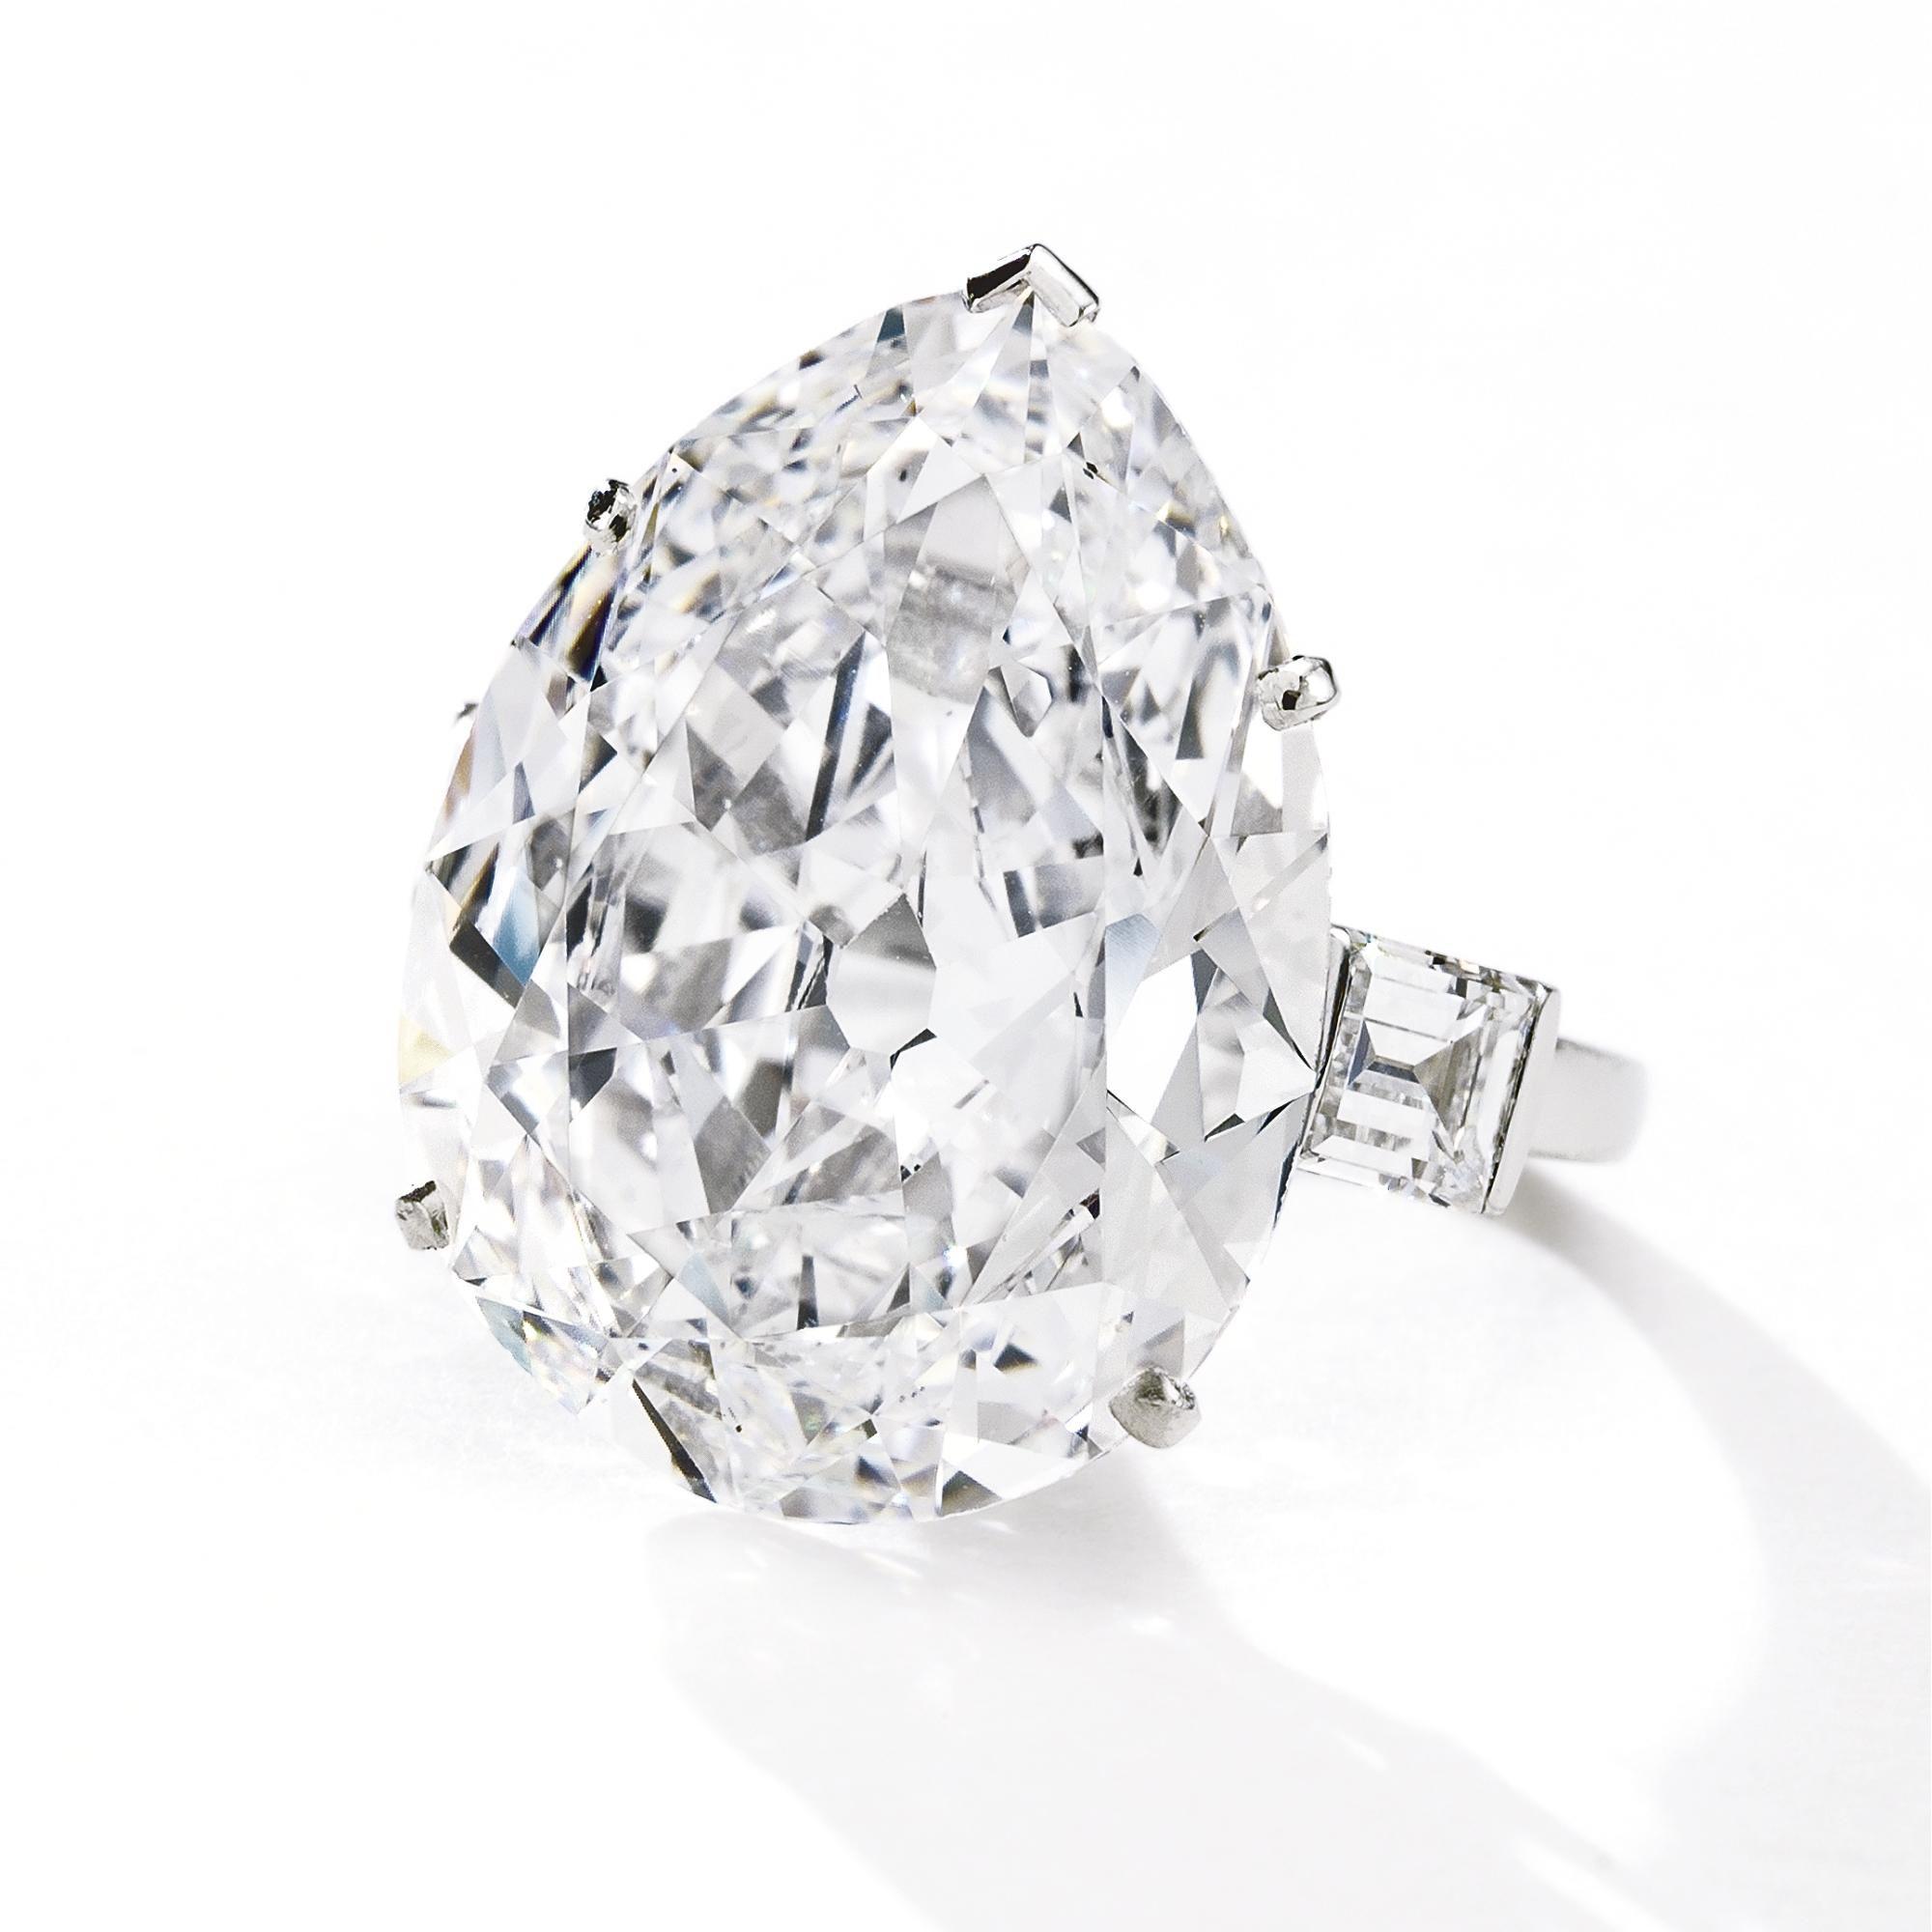 Diamond ring Mounted by Boucheron Paris The pear shaped diamond